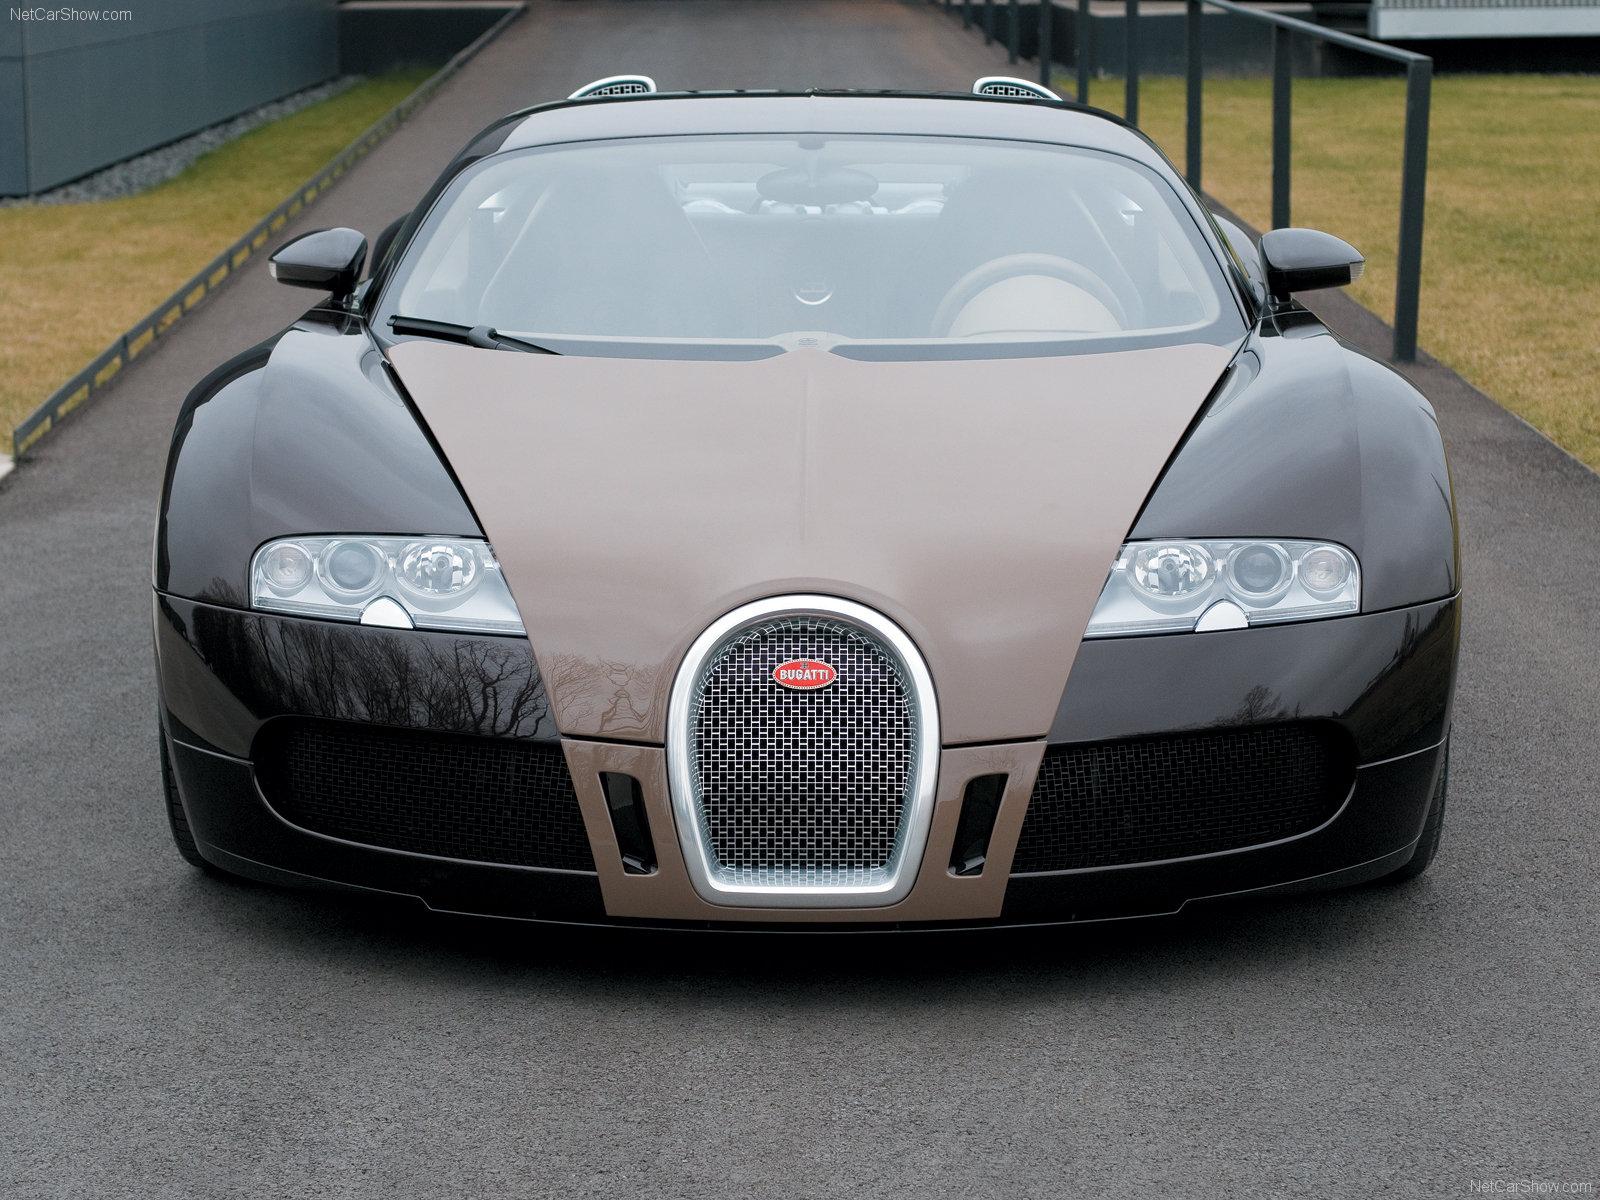 Bugatti Veyron Hd Wallpapers Free Hd Wallpapers